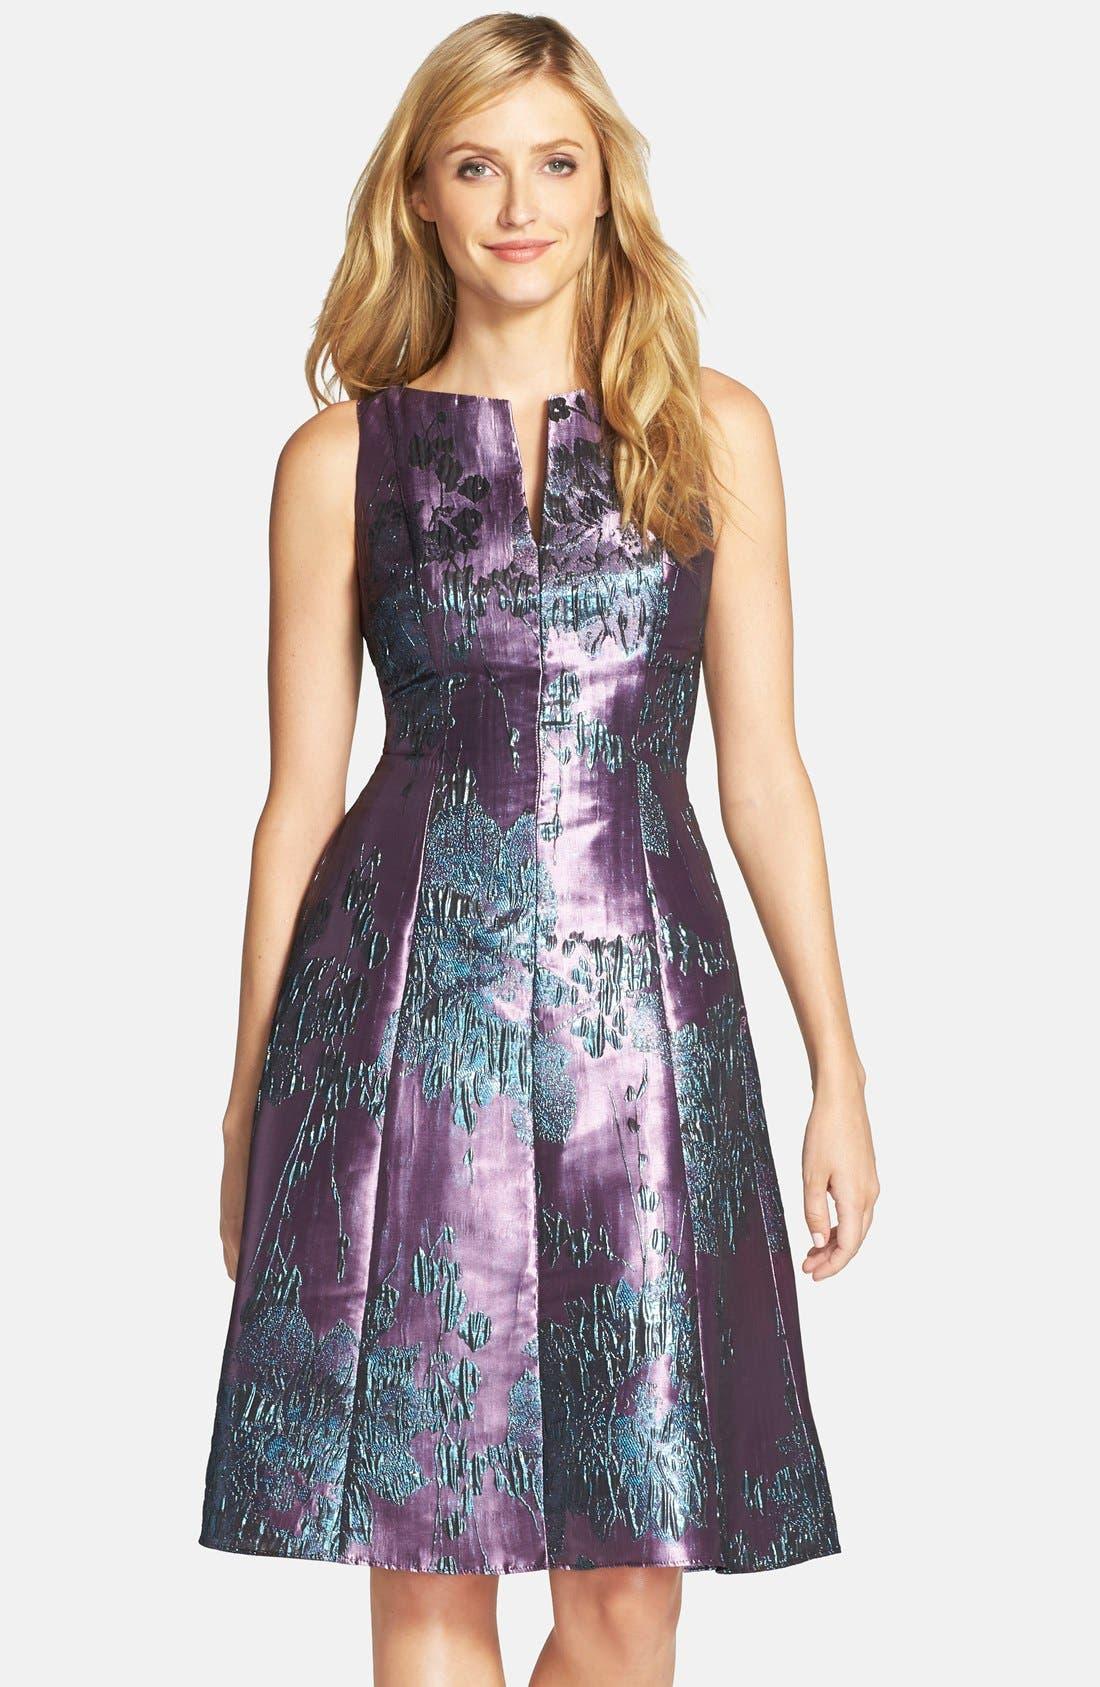 Alternate Image 1 Selected - Adrianna Papell Metallic Jacquard Fit & Flare Dress (Regular & Petite)